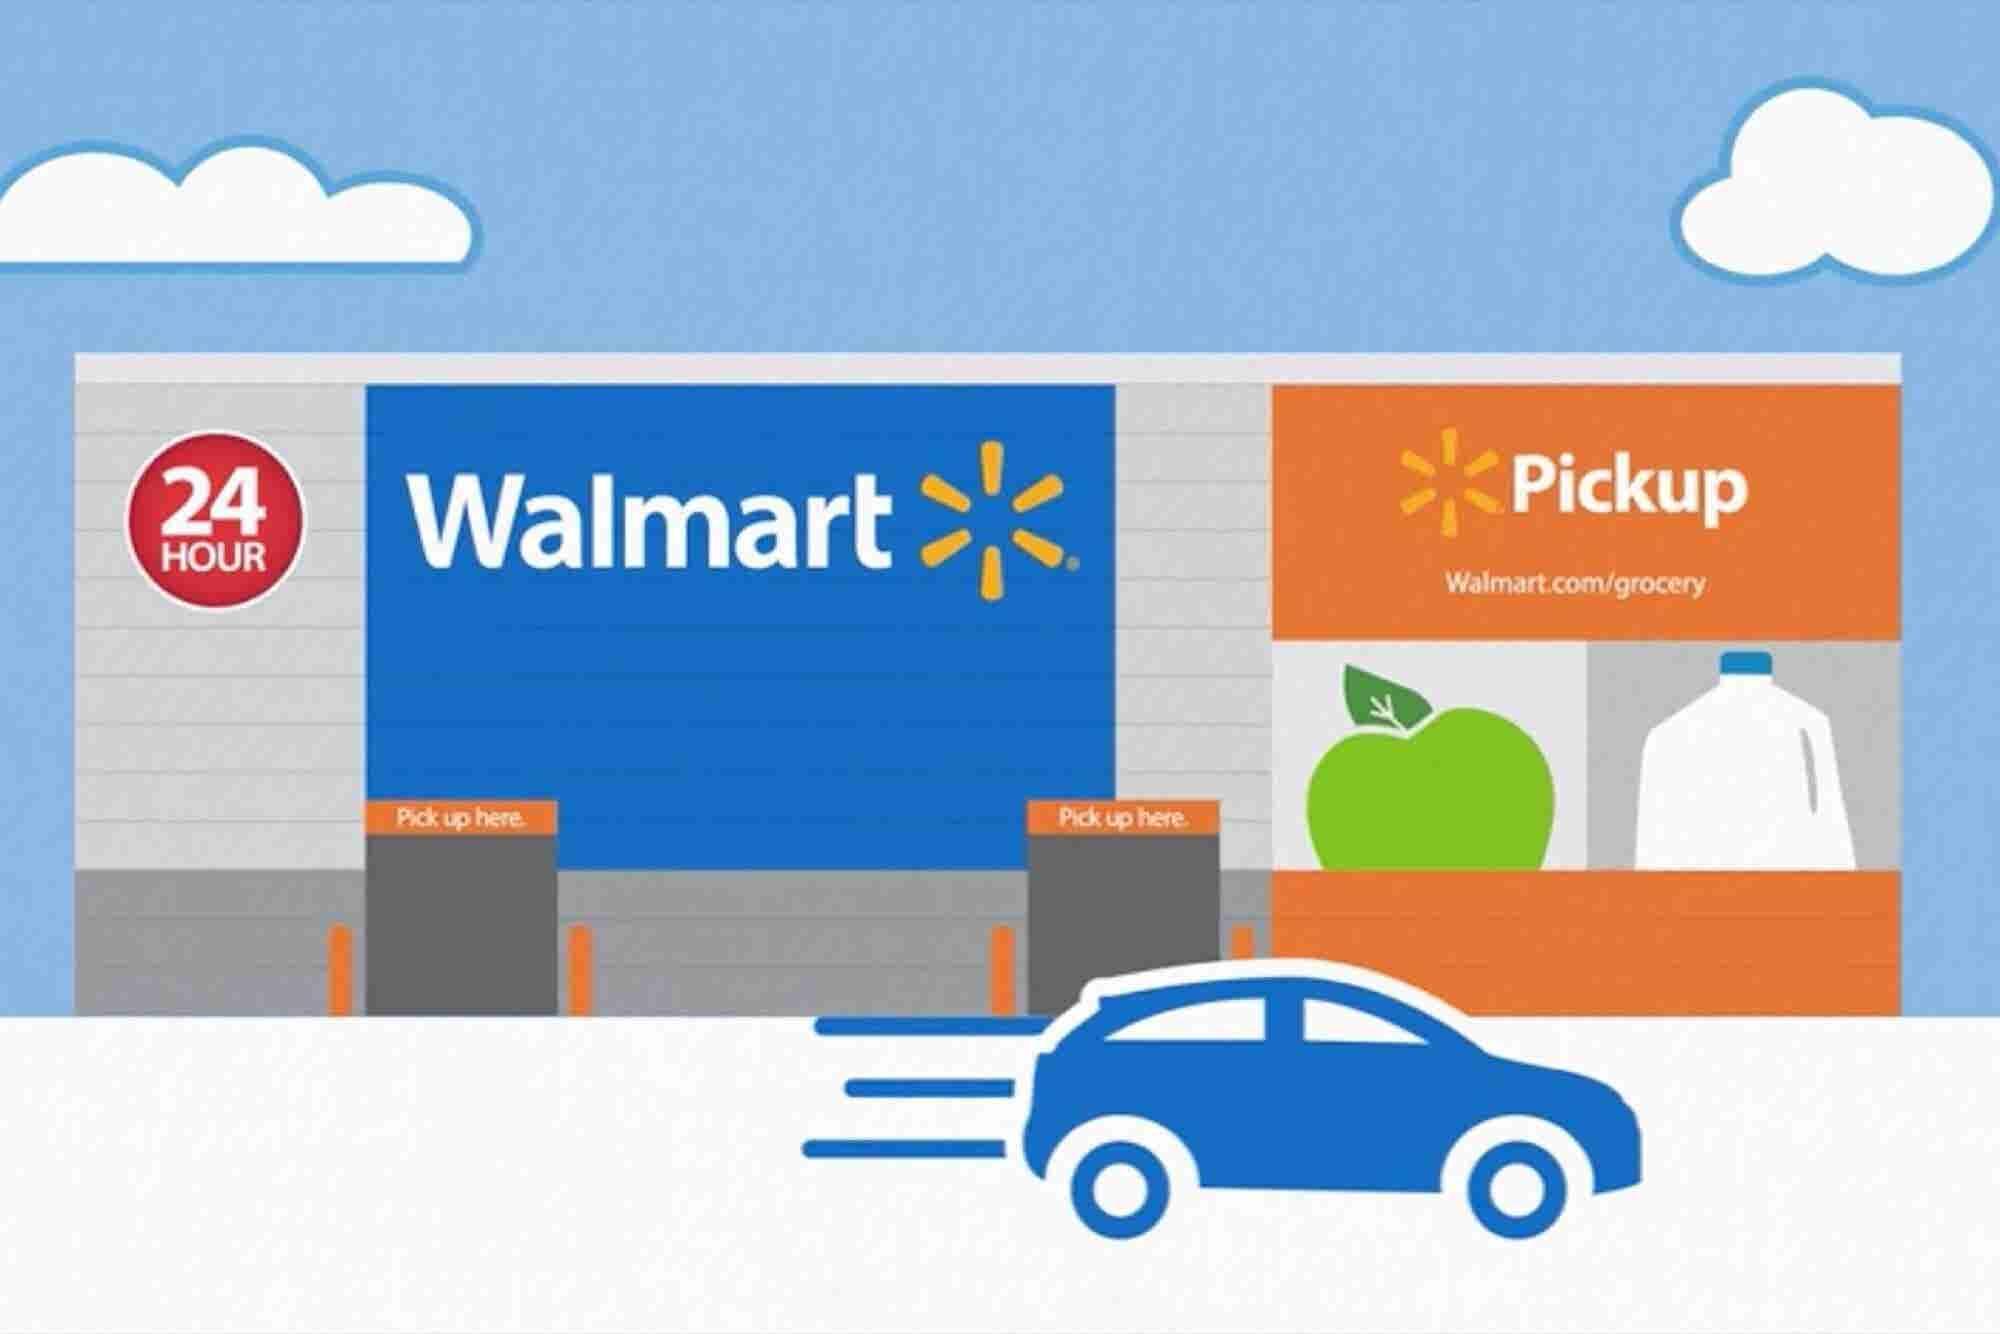 Walmart Opens 24-Hour Grocery Pickup Kiosk